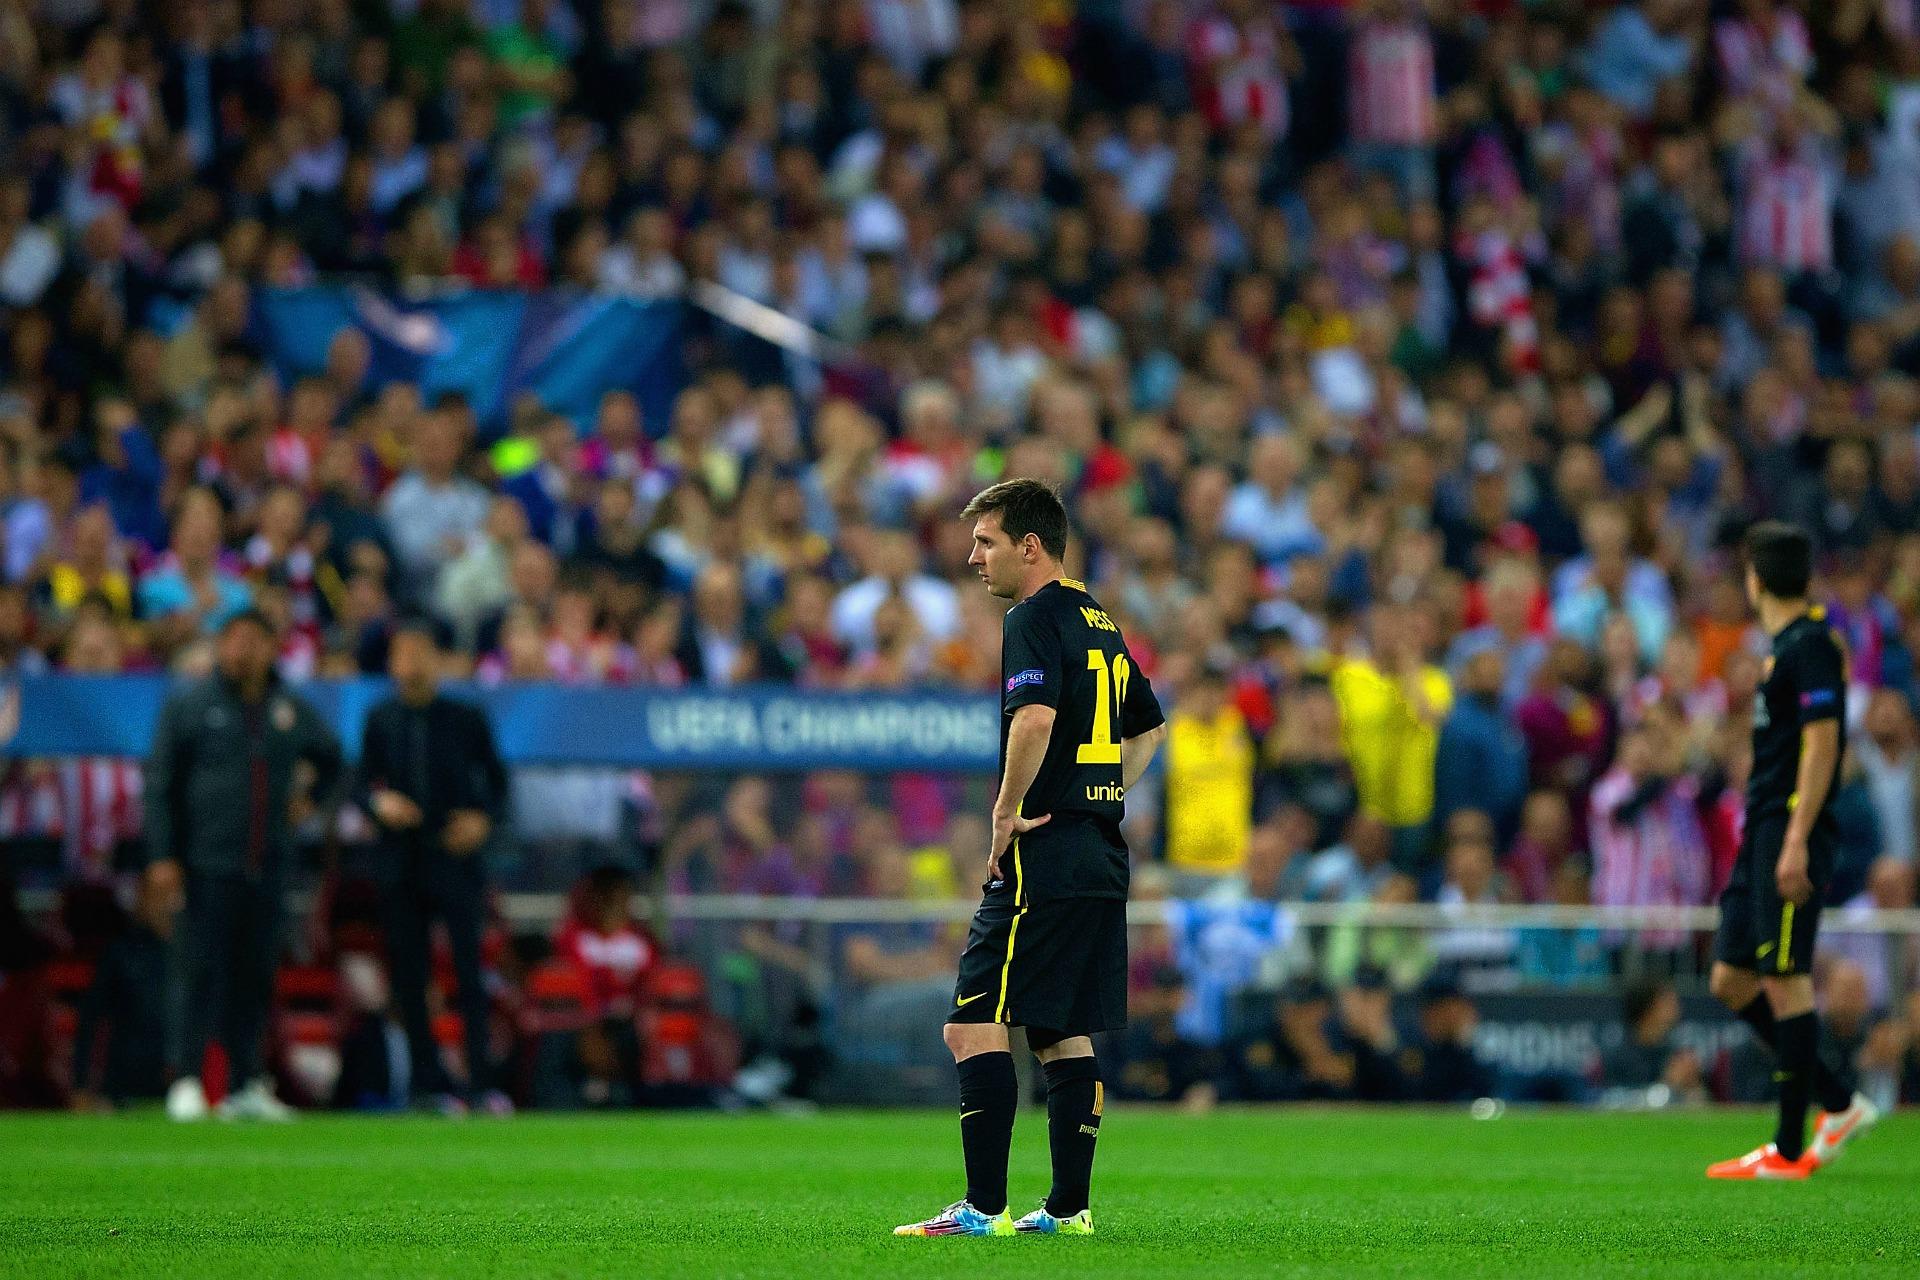 La noche de Messi